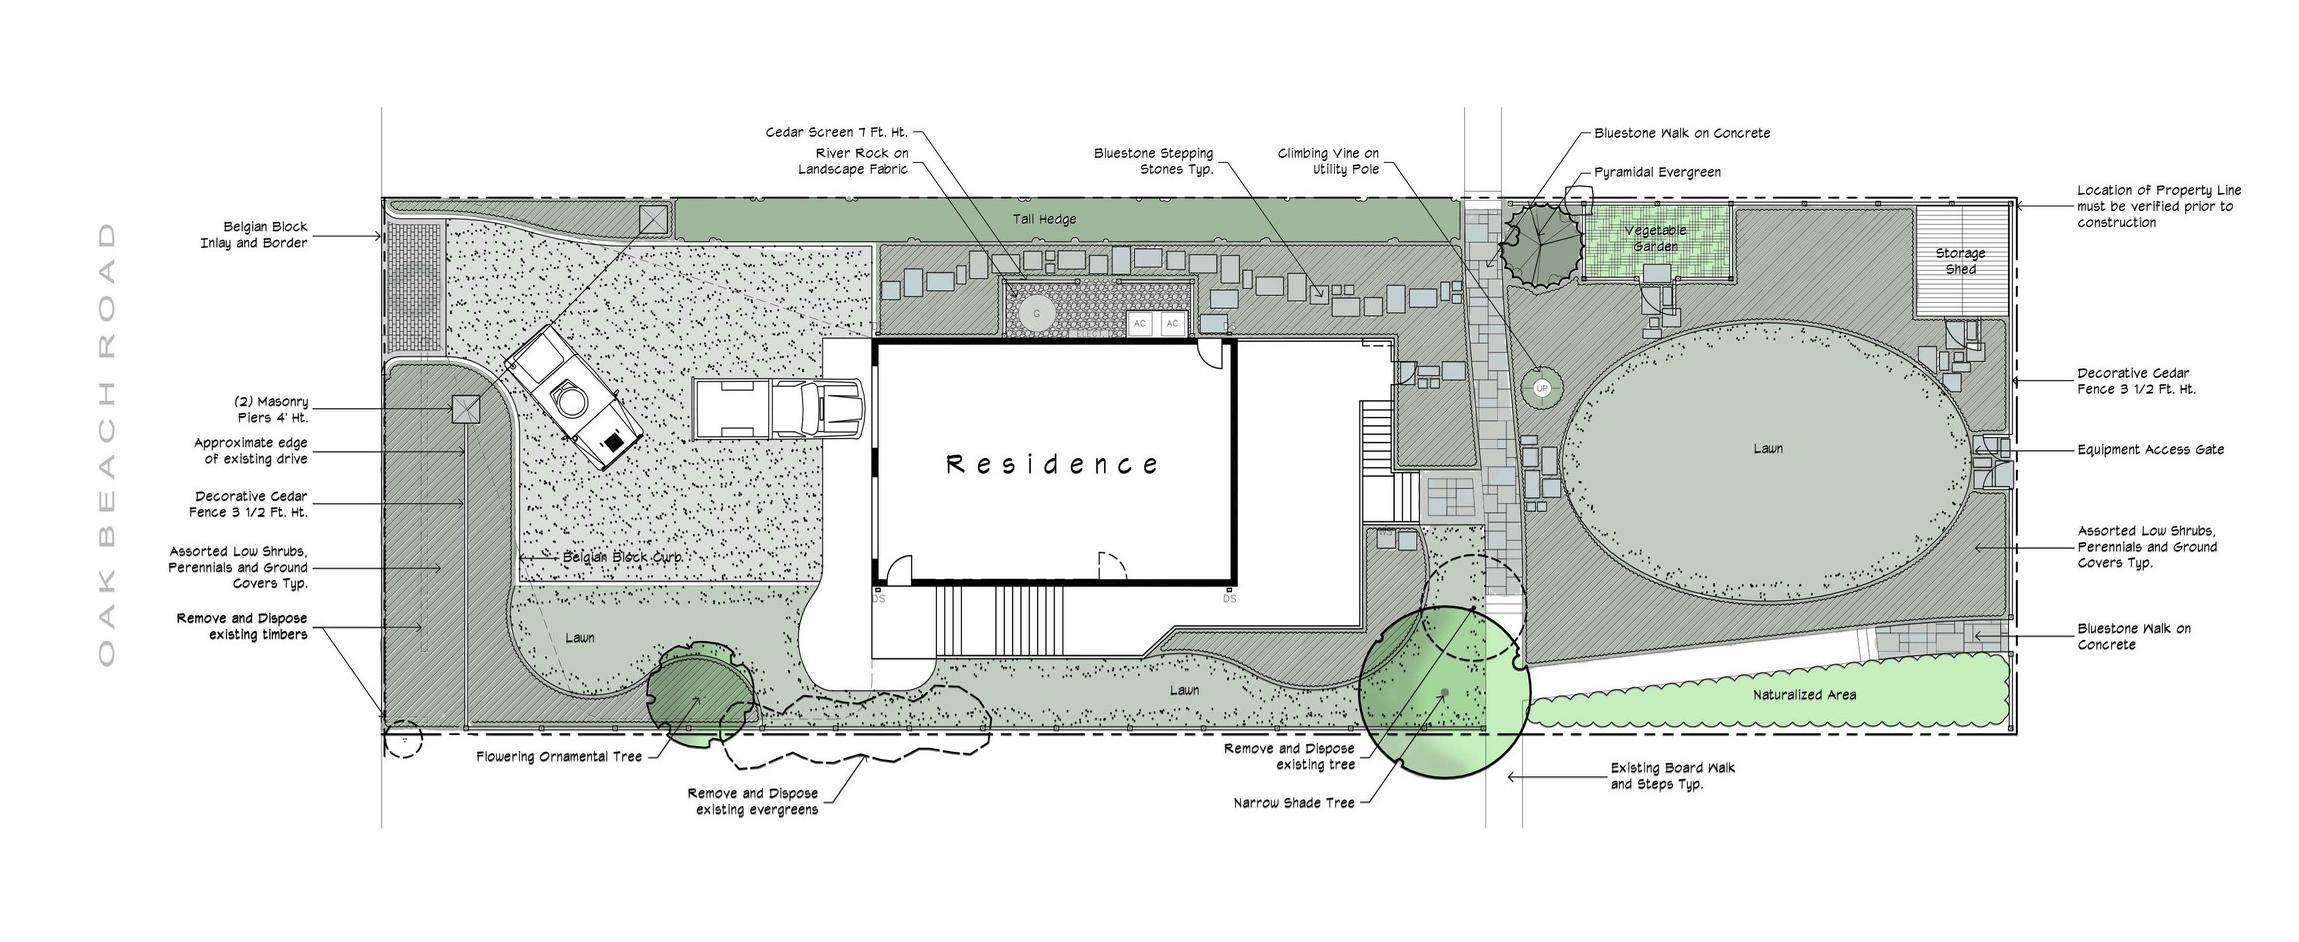 Final LandscapeConcept Plan (Residential)